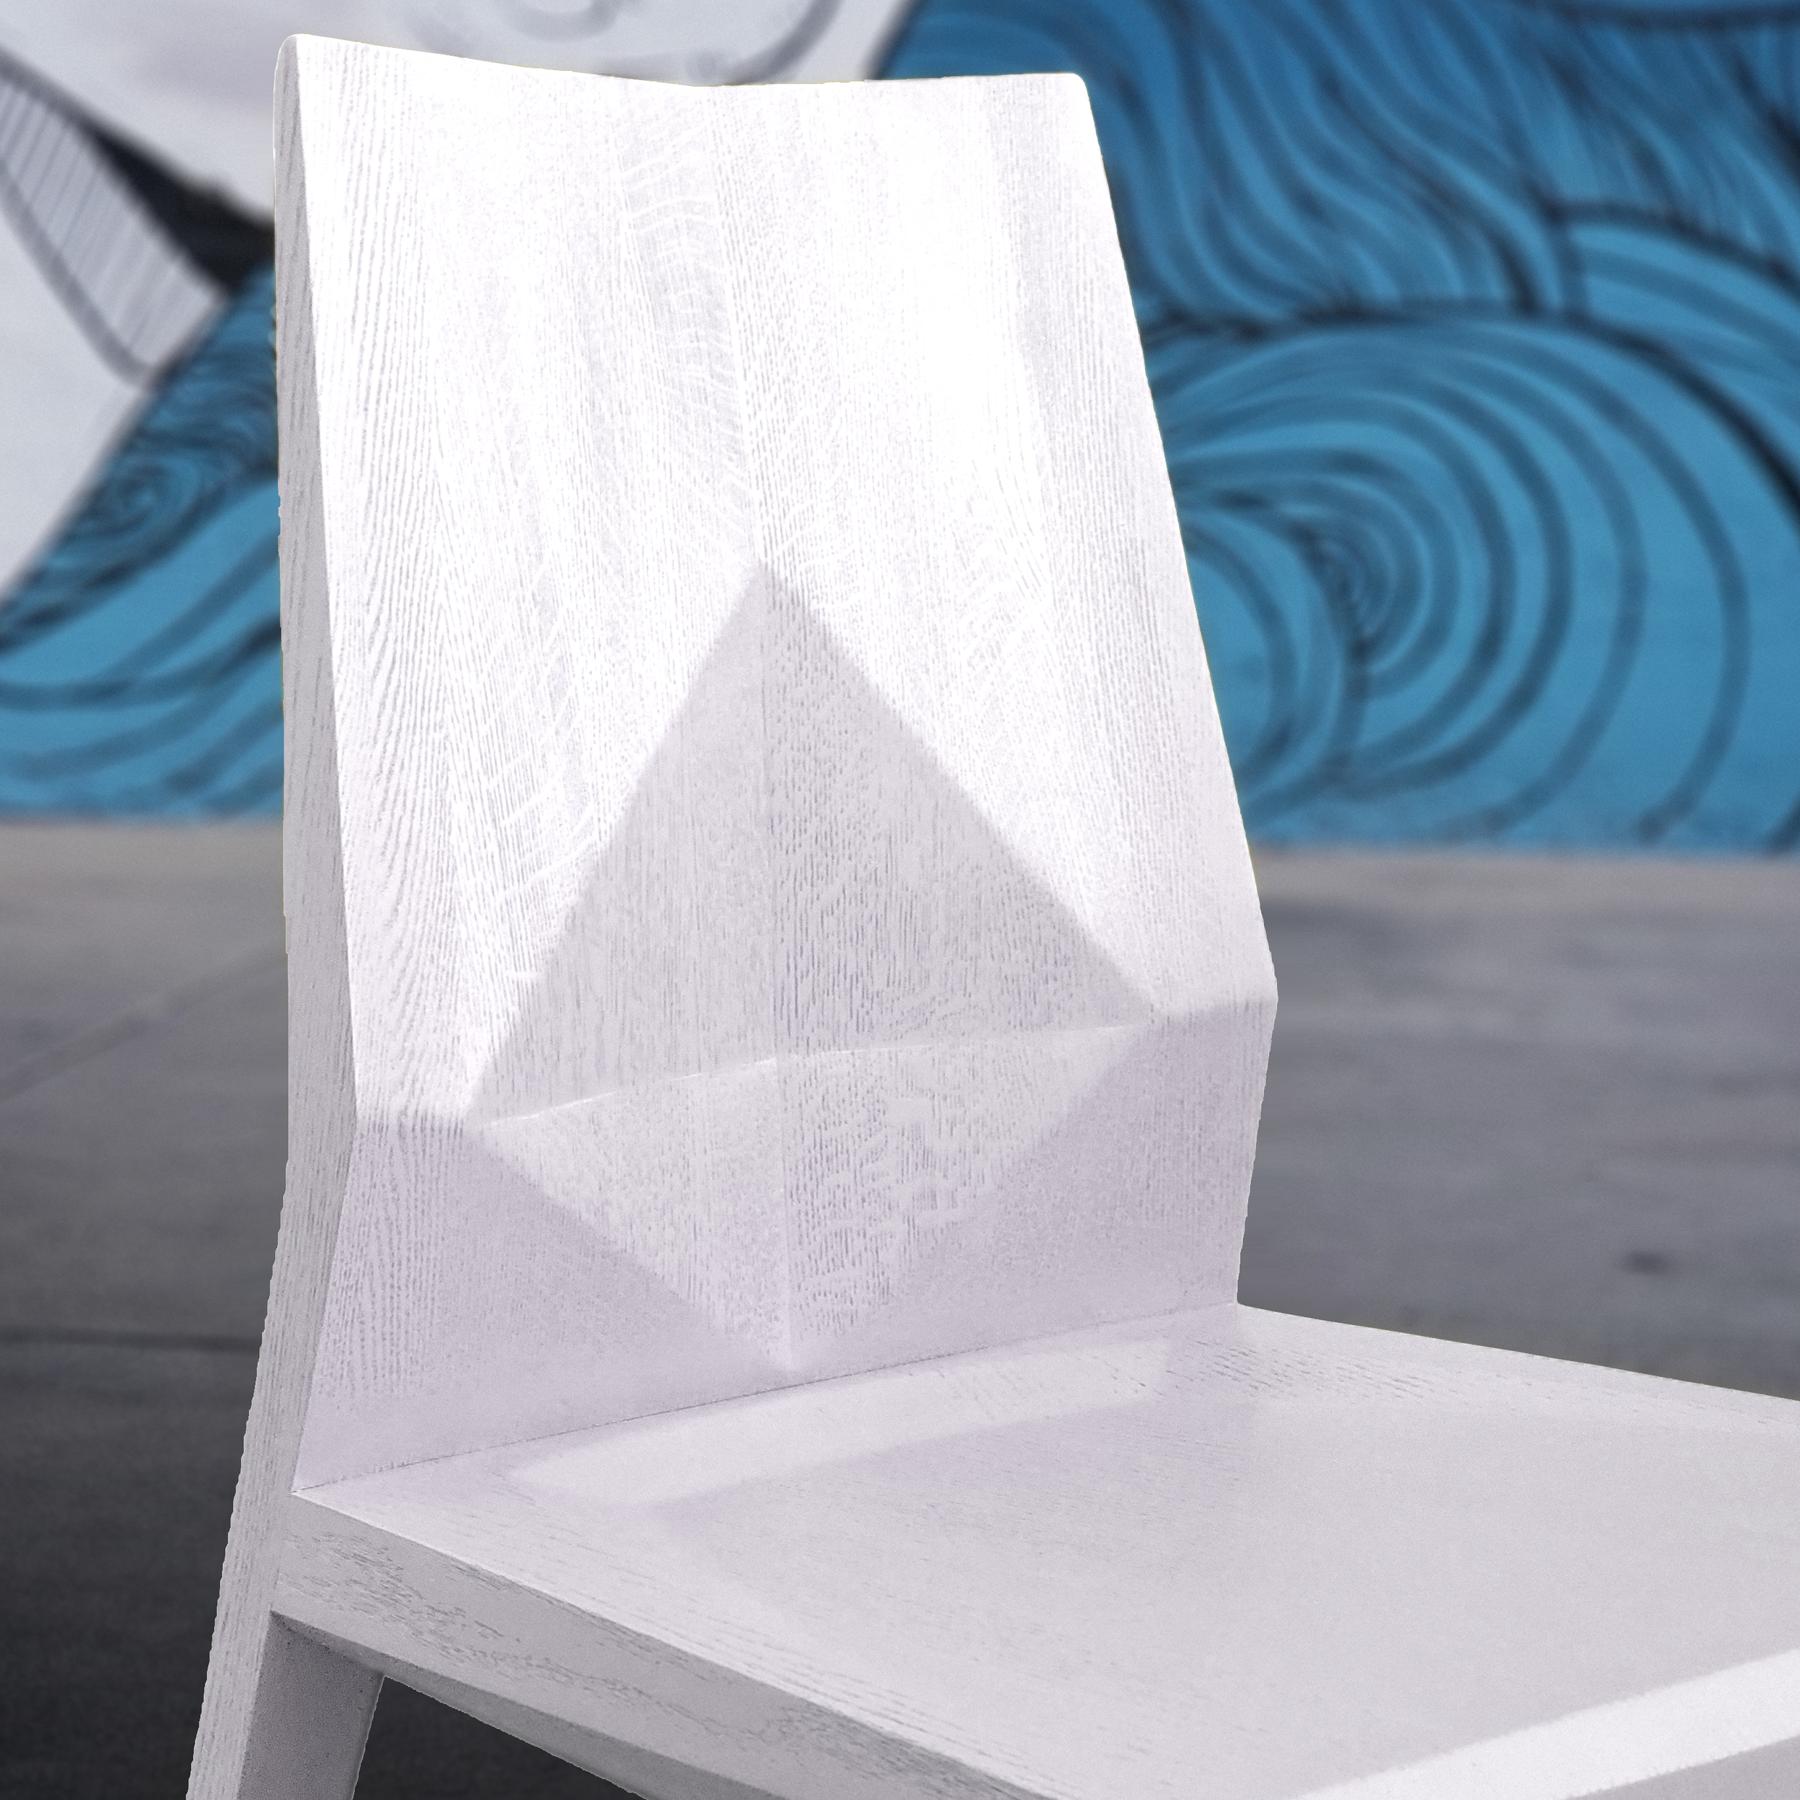 November Chair in   Majestic   finish